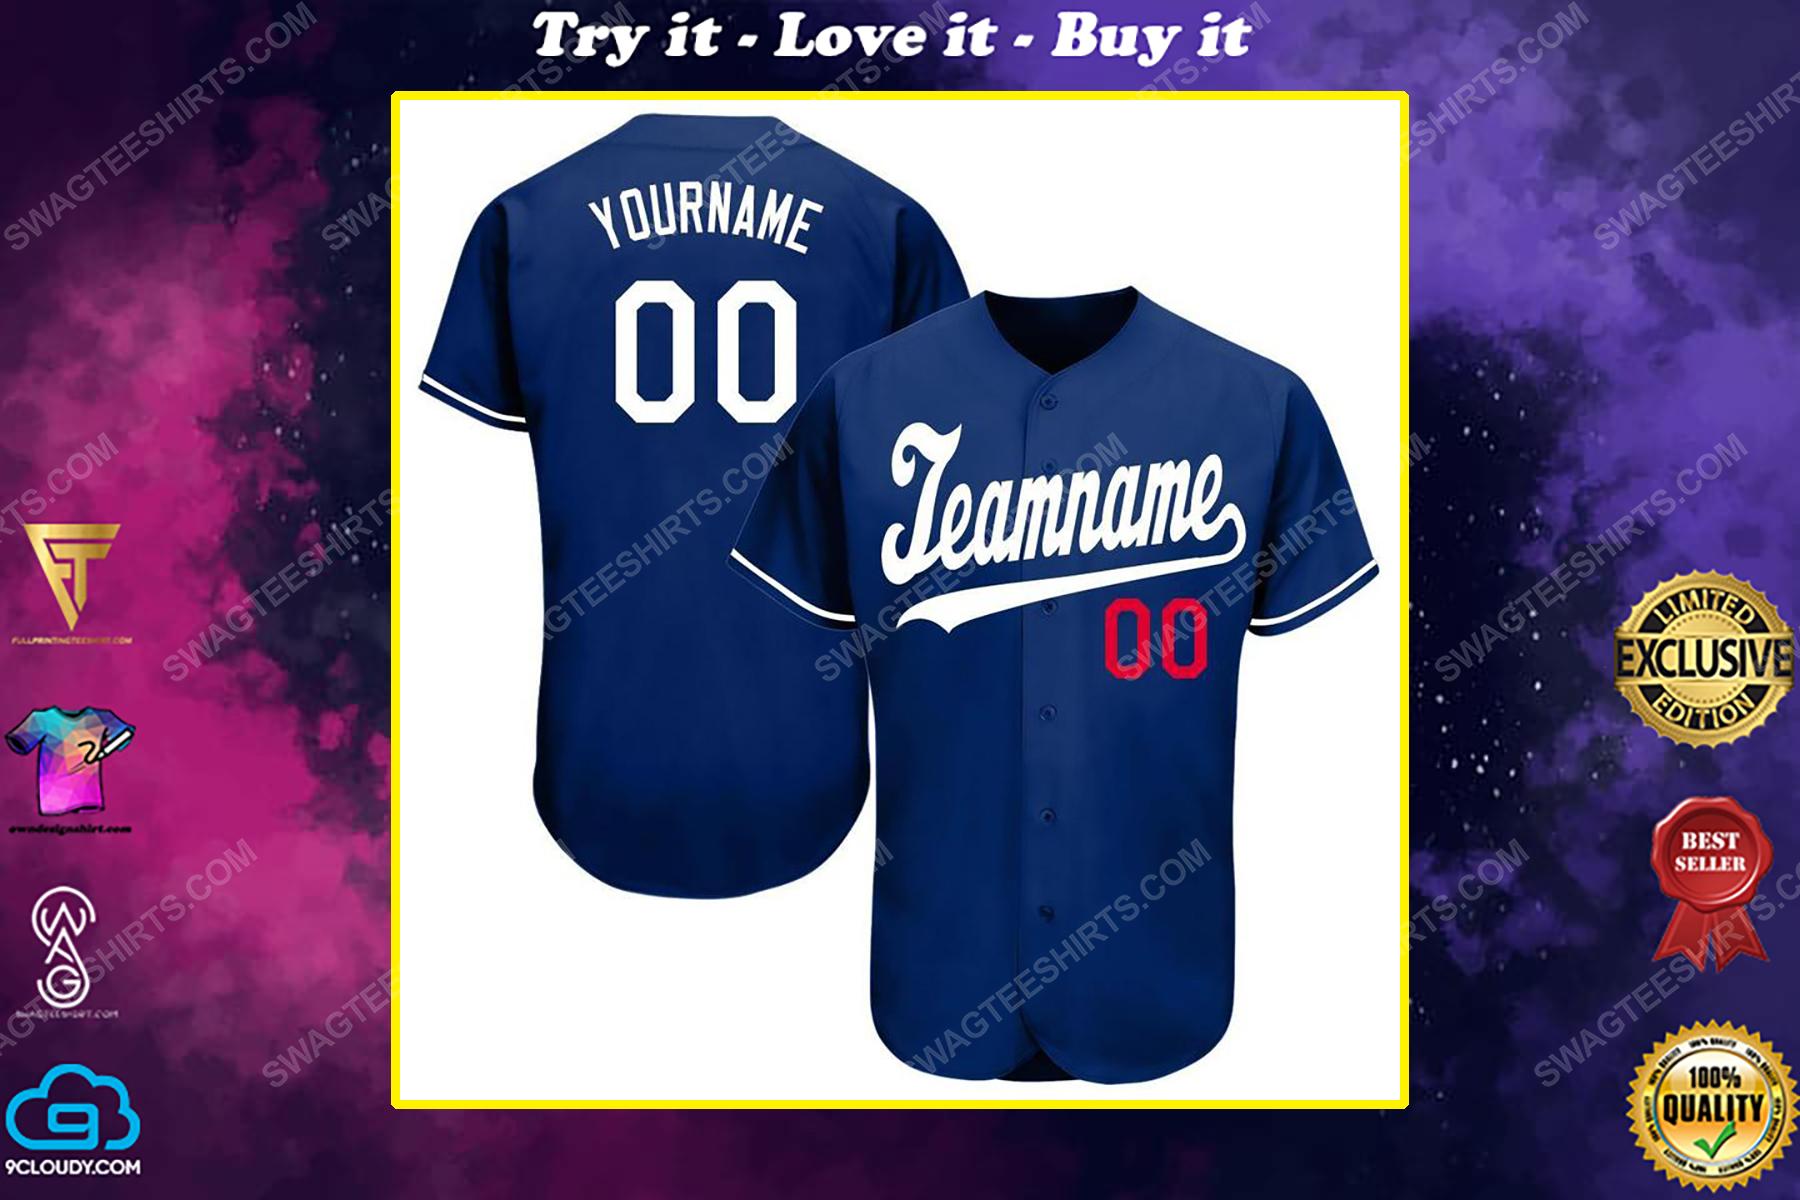 Custom team name los angeles dodgers full printed baseball jersey